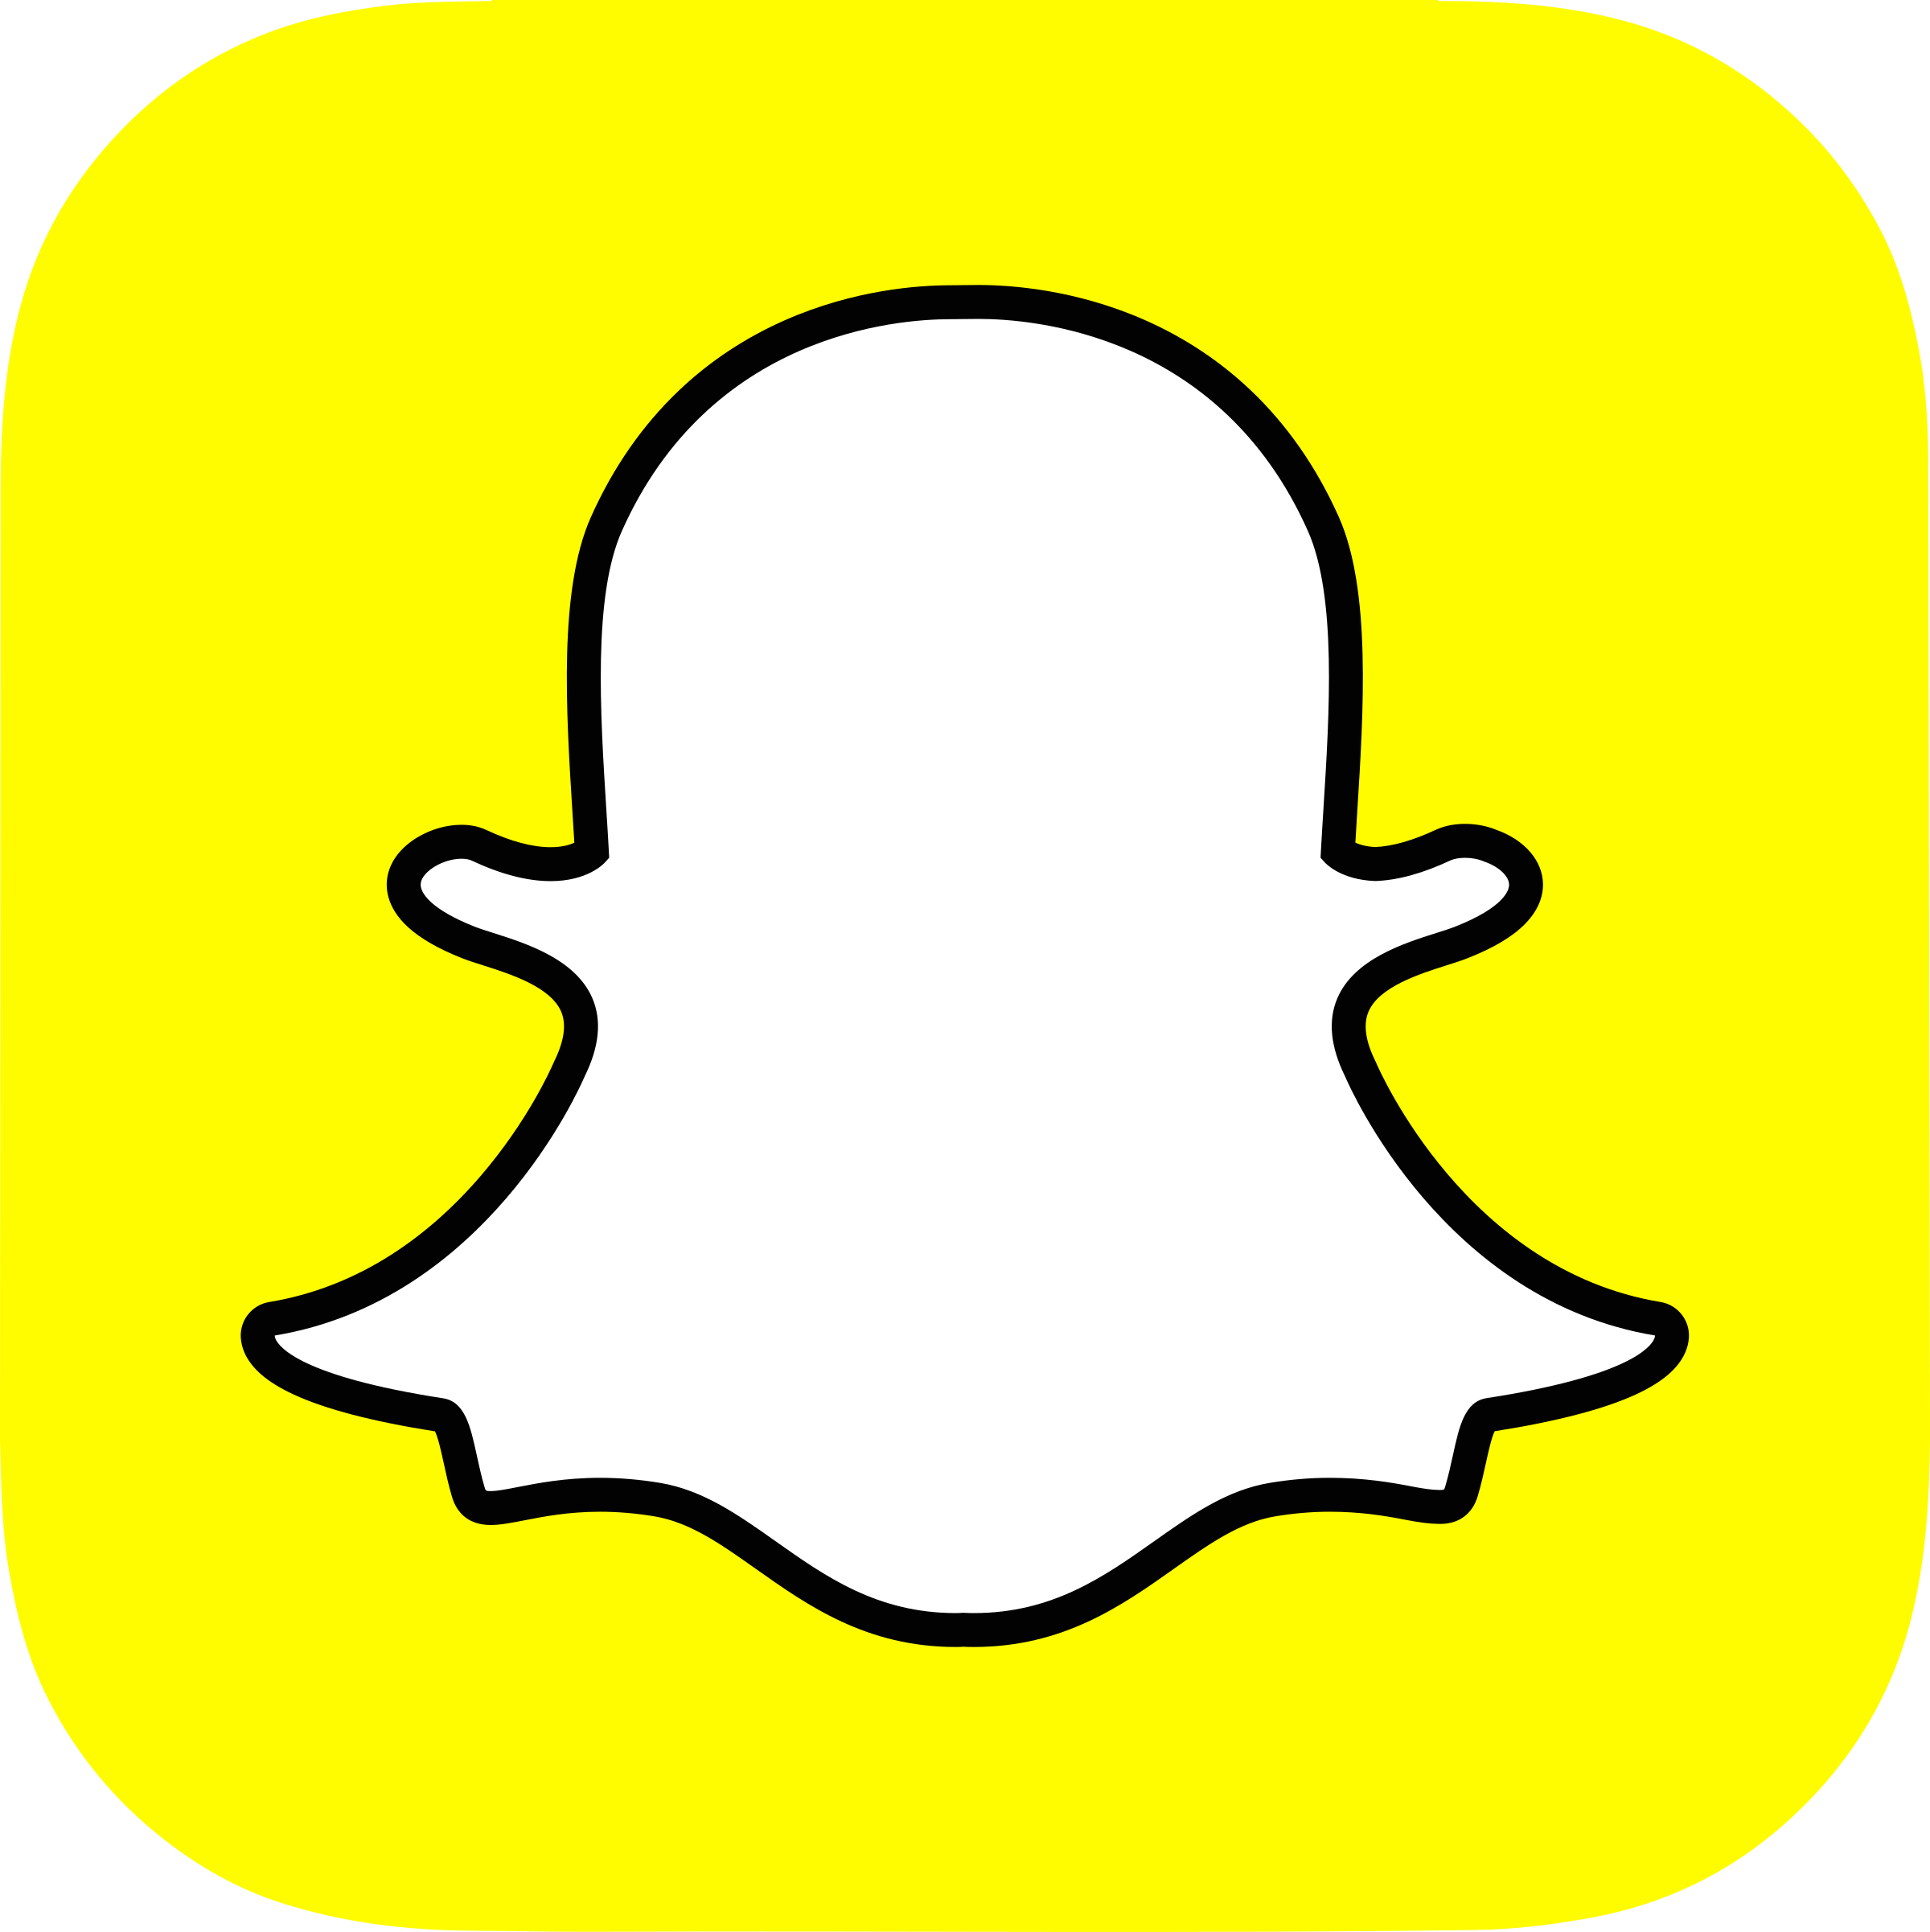 Snapchat Logo PNG Transparent & SVG Vector - Freebie Supply